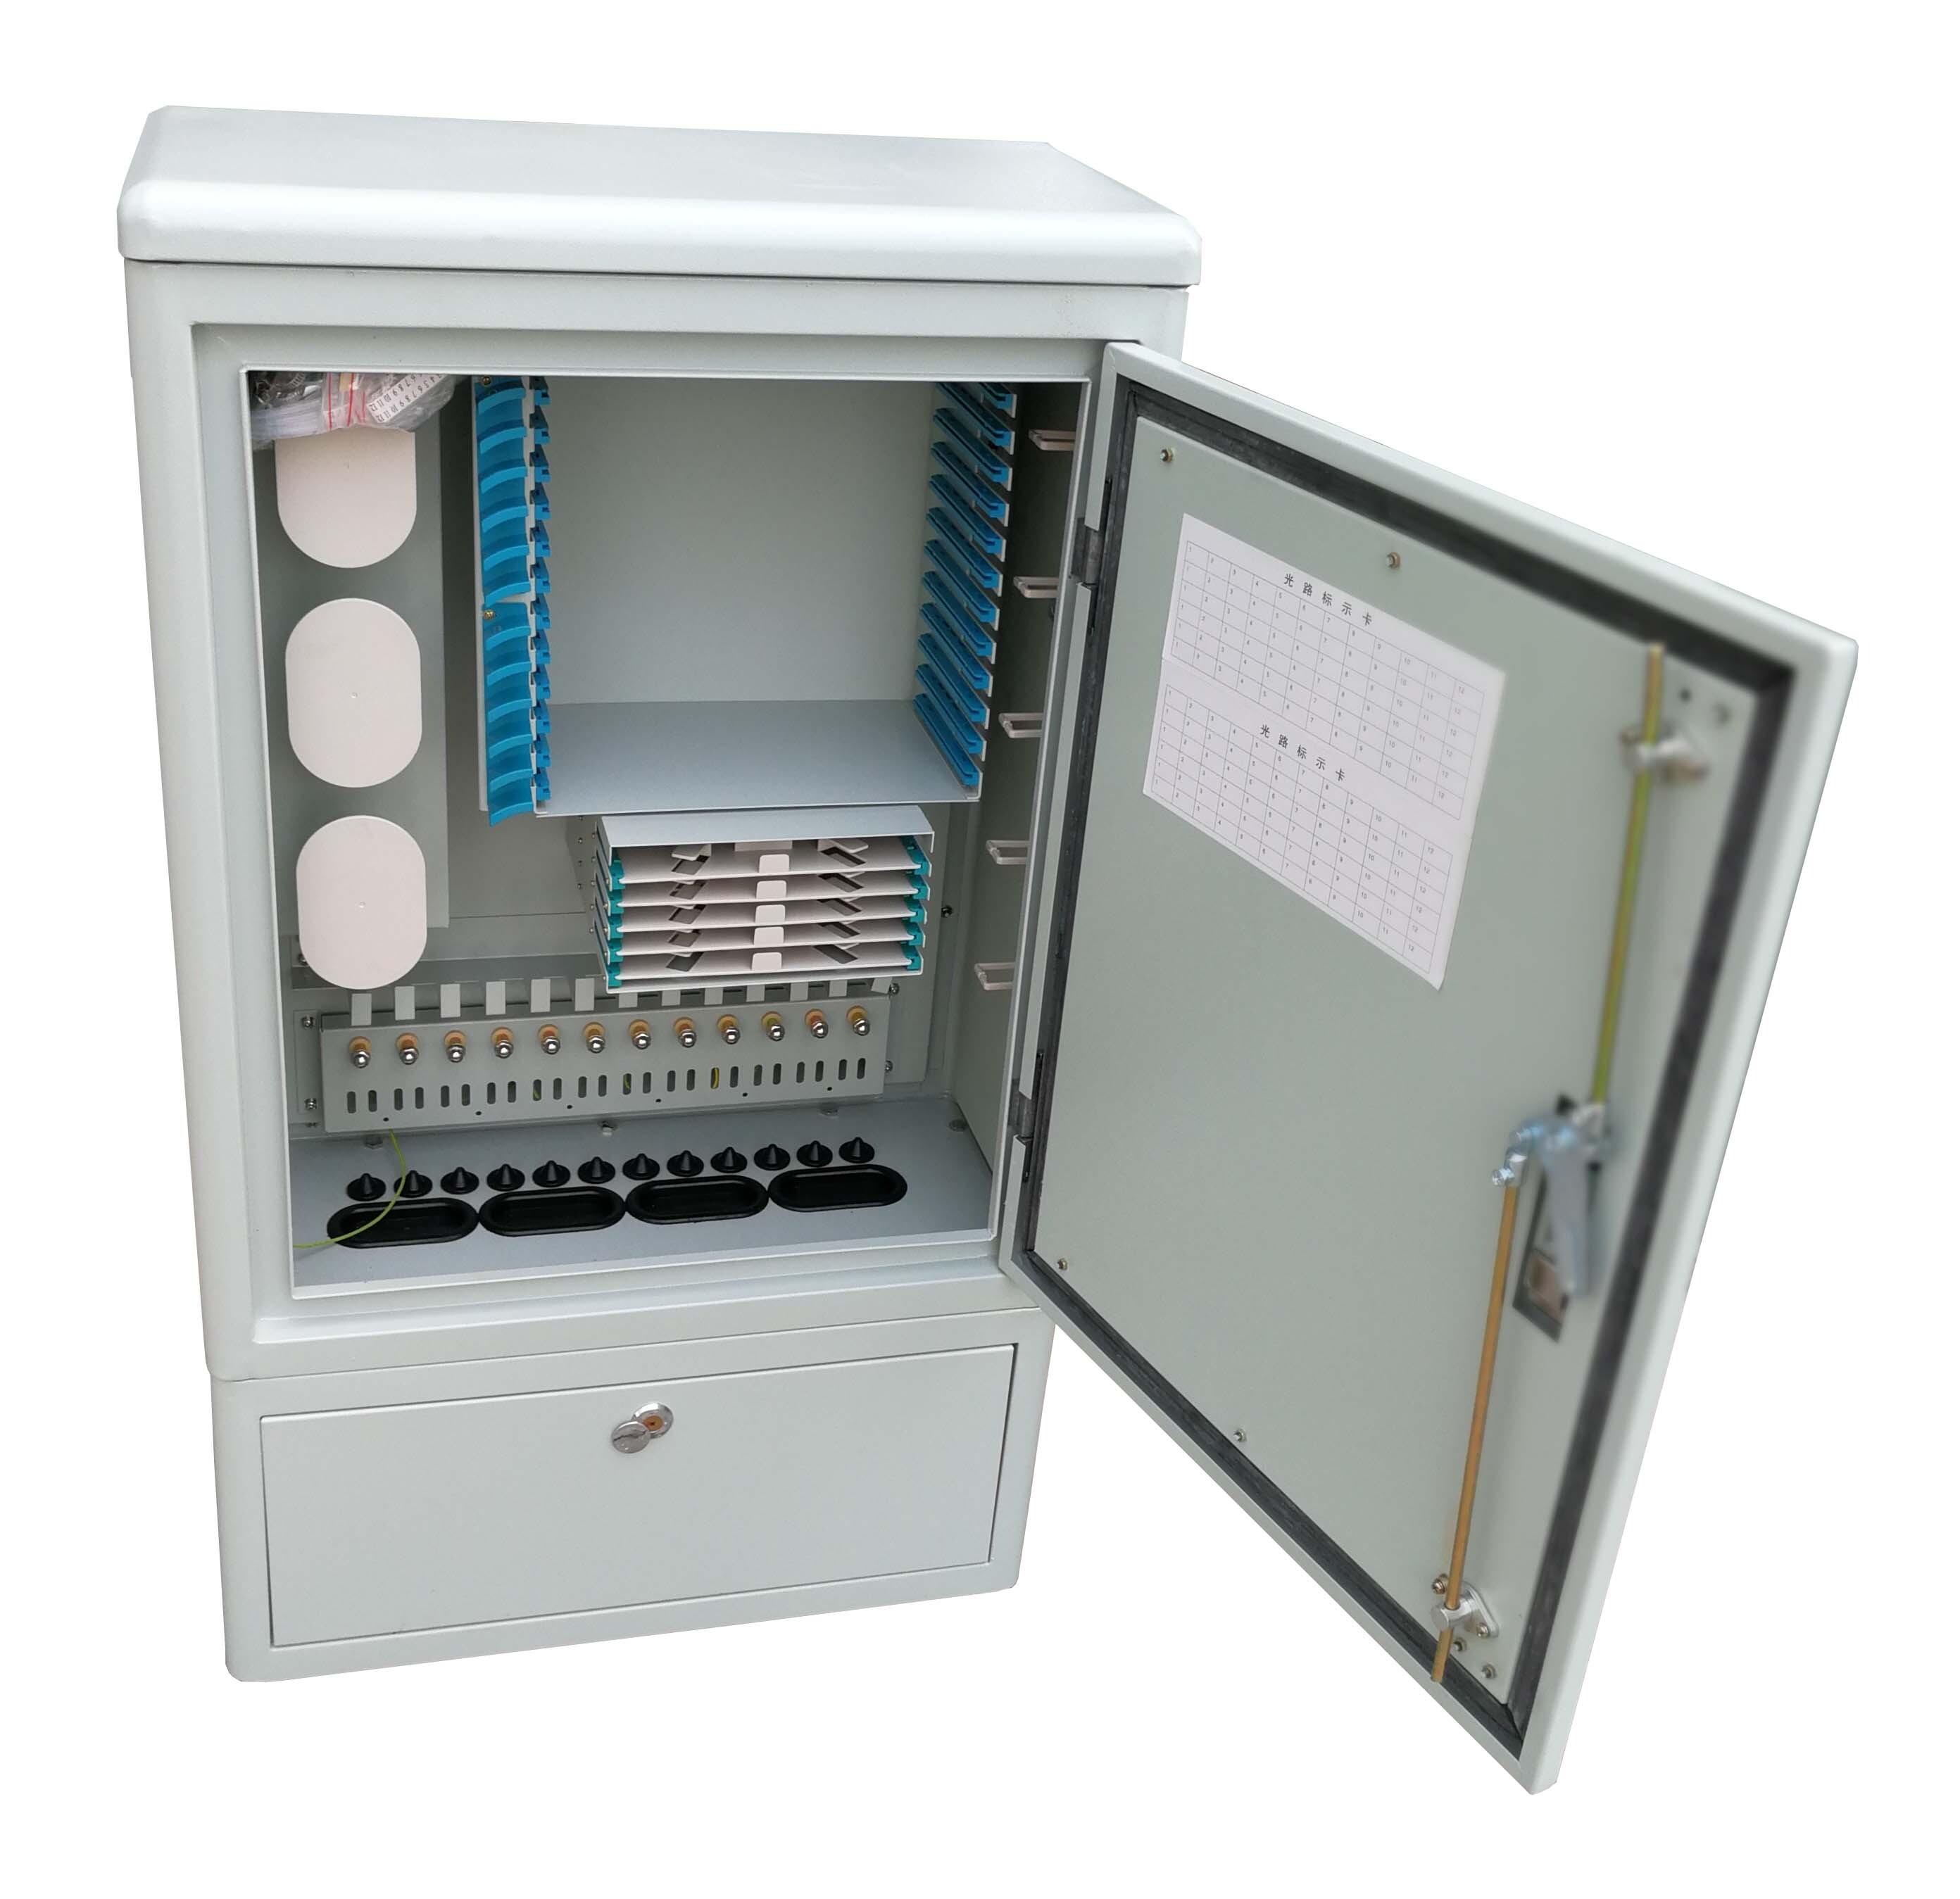 Fiber Optic Linking Cabinets